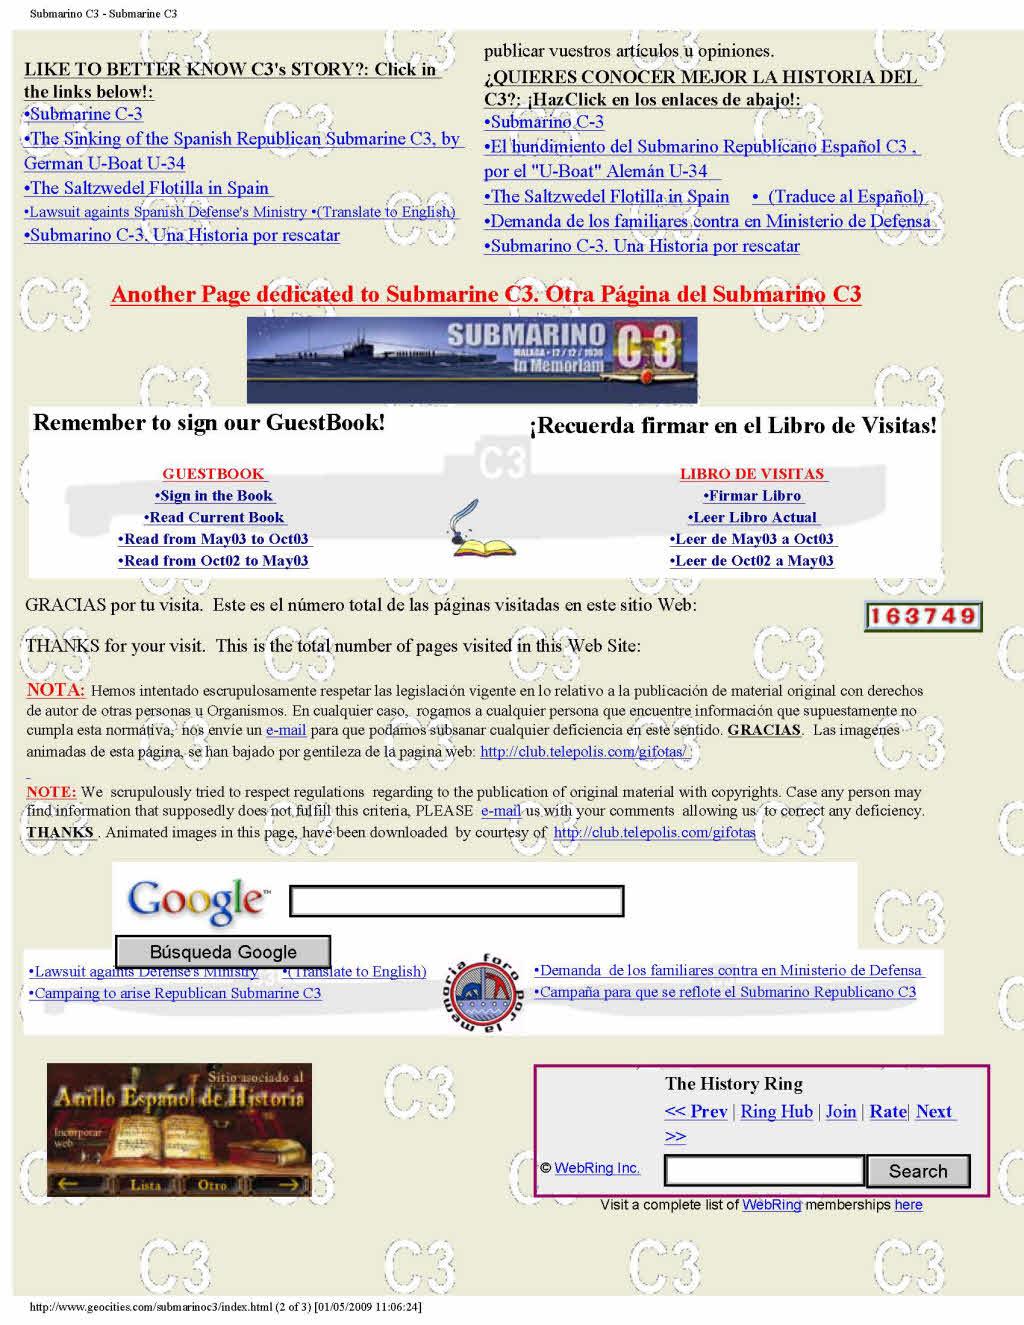 WebAntiguaOptimizado_Page_002.jpg